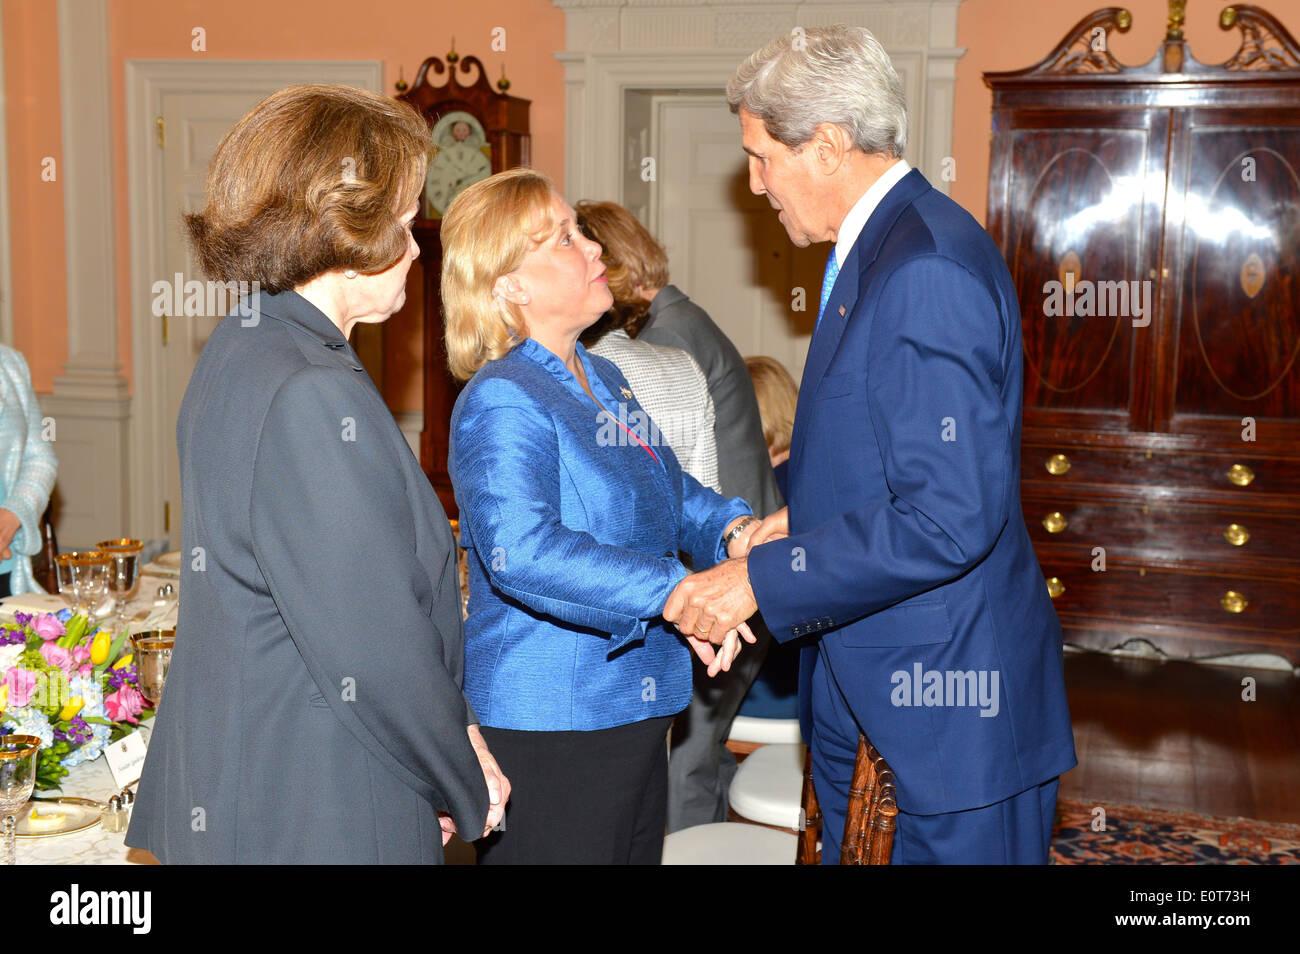 Secretary Kerry Greets Senator Landrieu - Stock Image